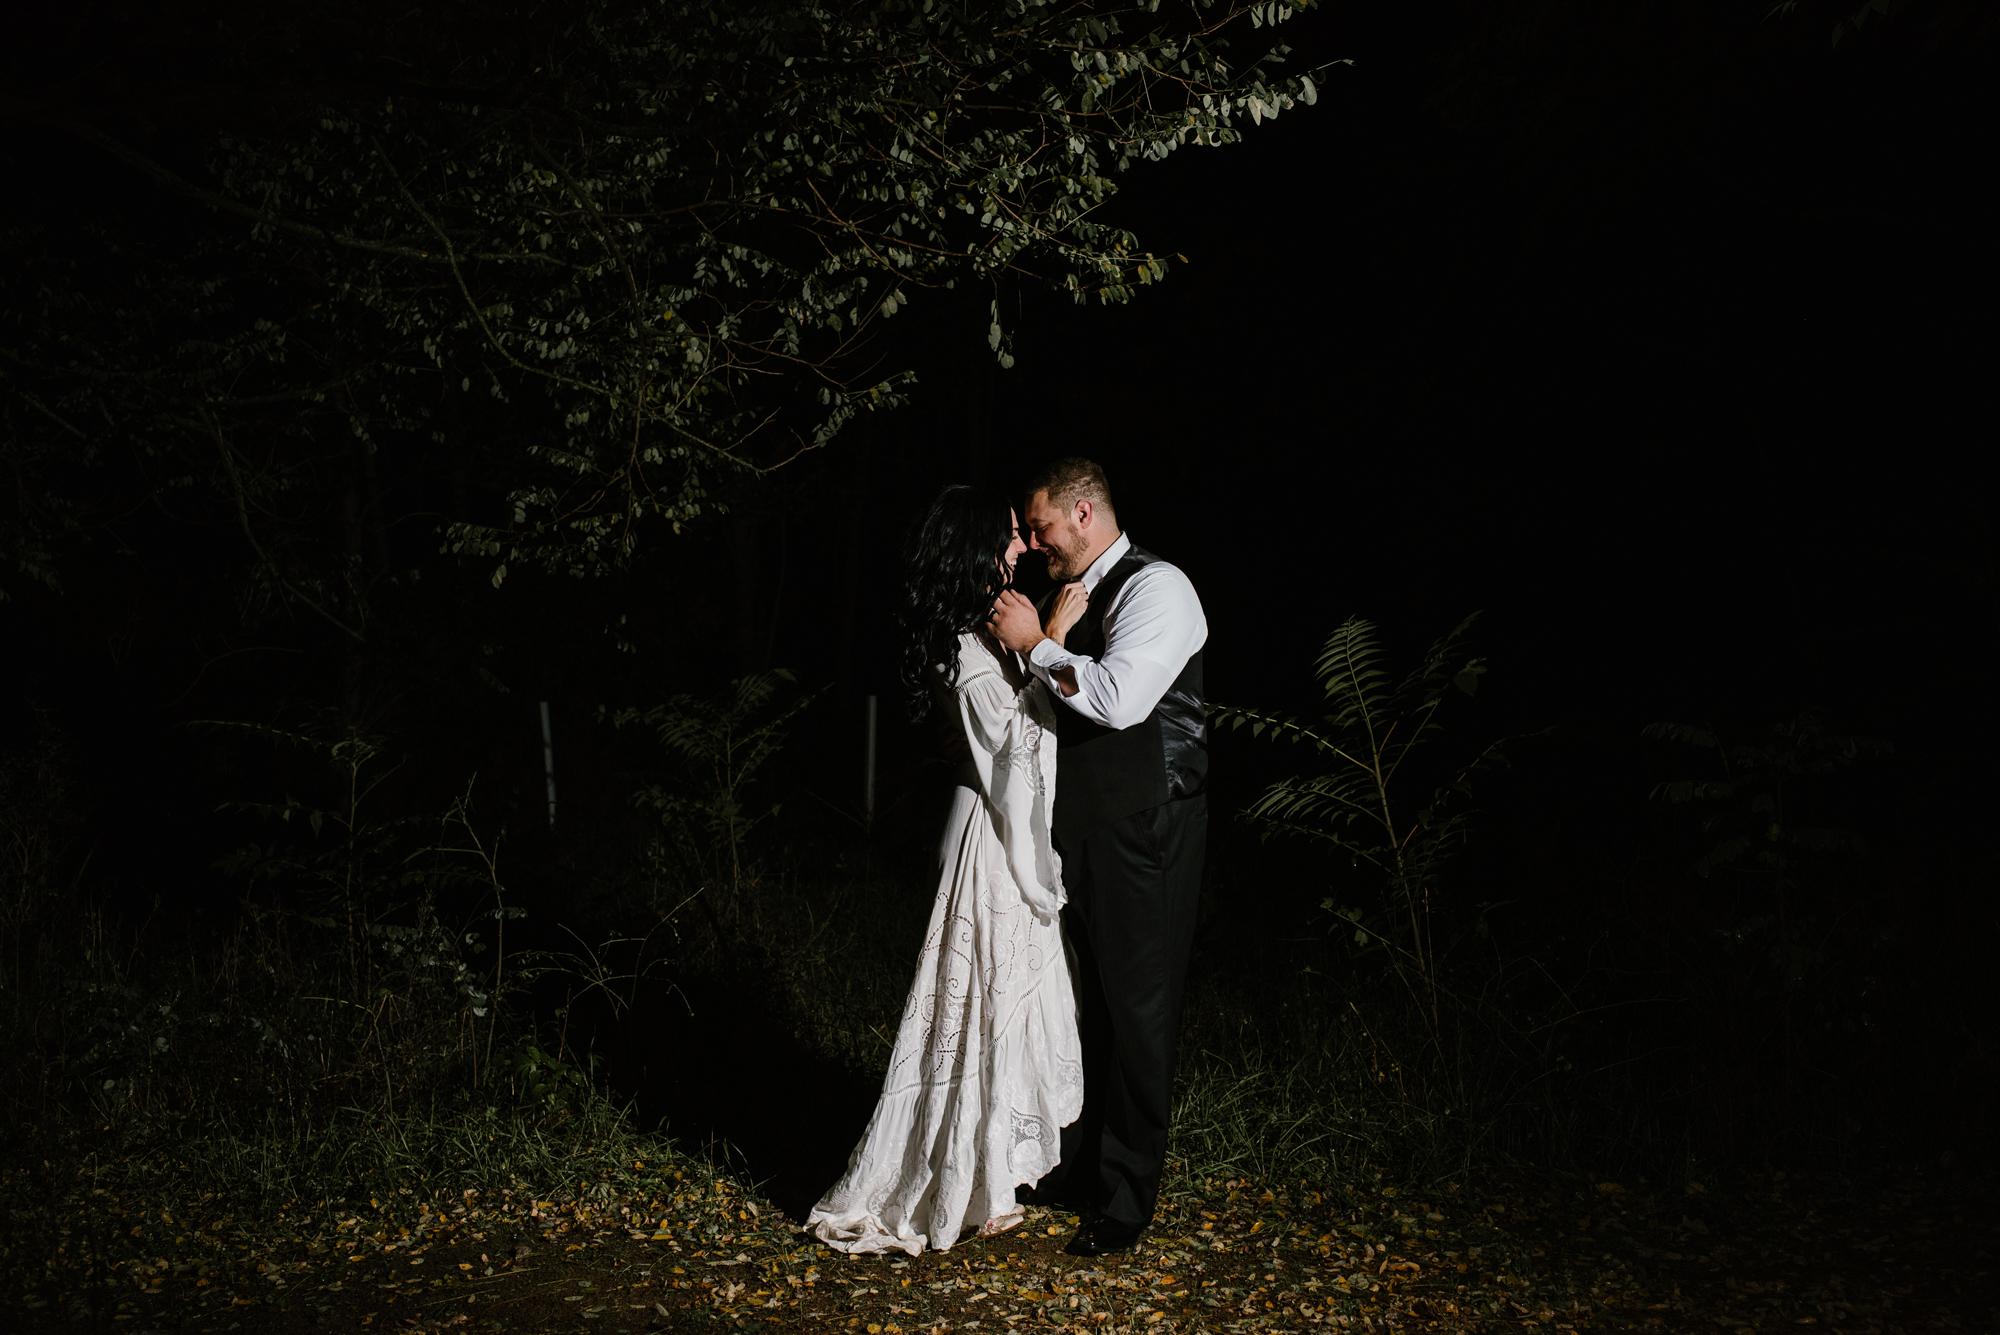 blue-dress-barn-benton-harbor-michigan-fall-wedding-photographer (3).jpg